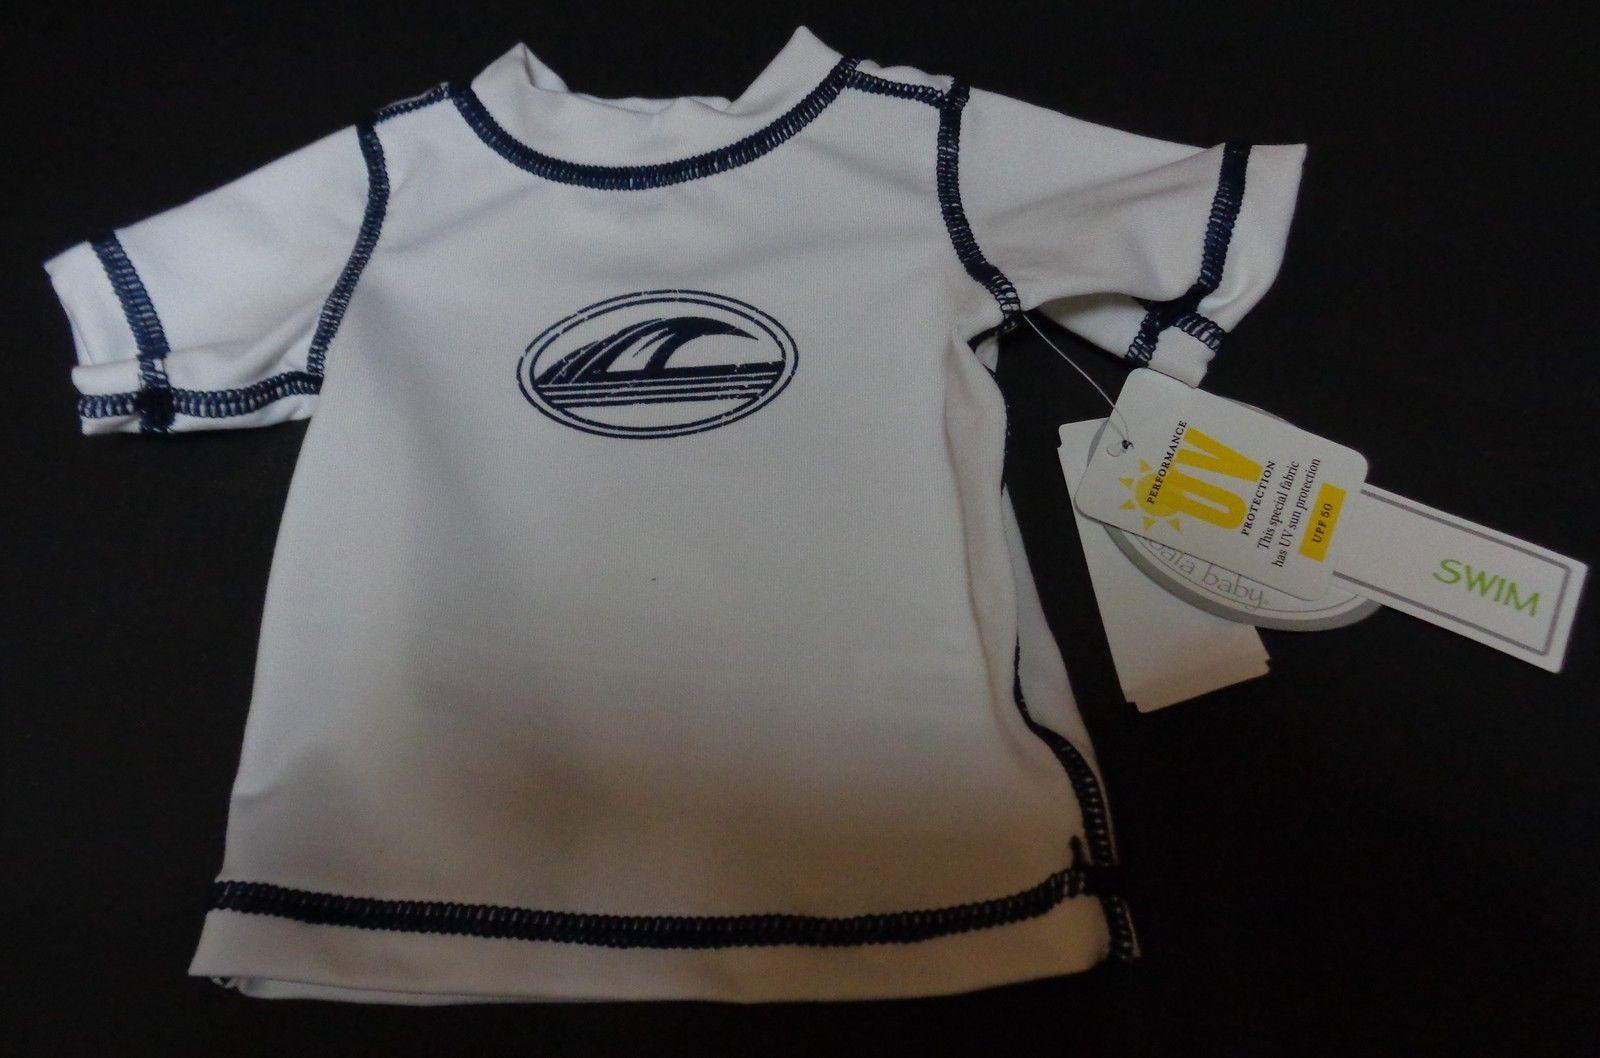 Koala Baby Boys Newborn Swim Shirt NWT WAVES White Short Sleeves UV Protection